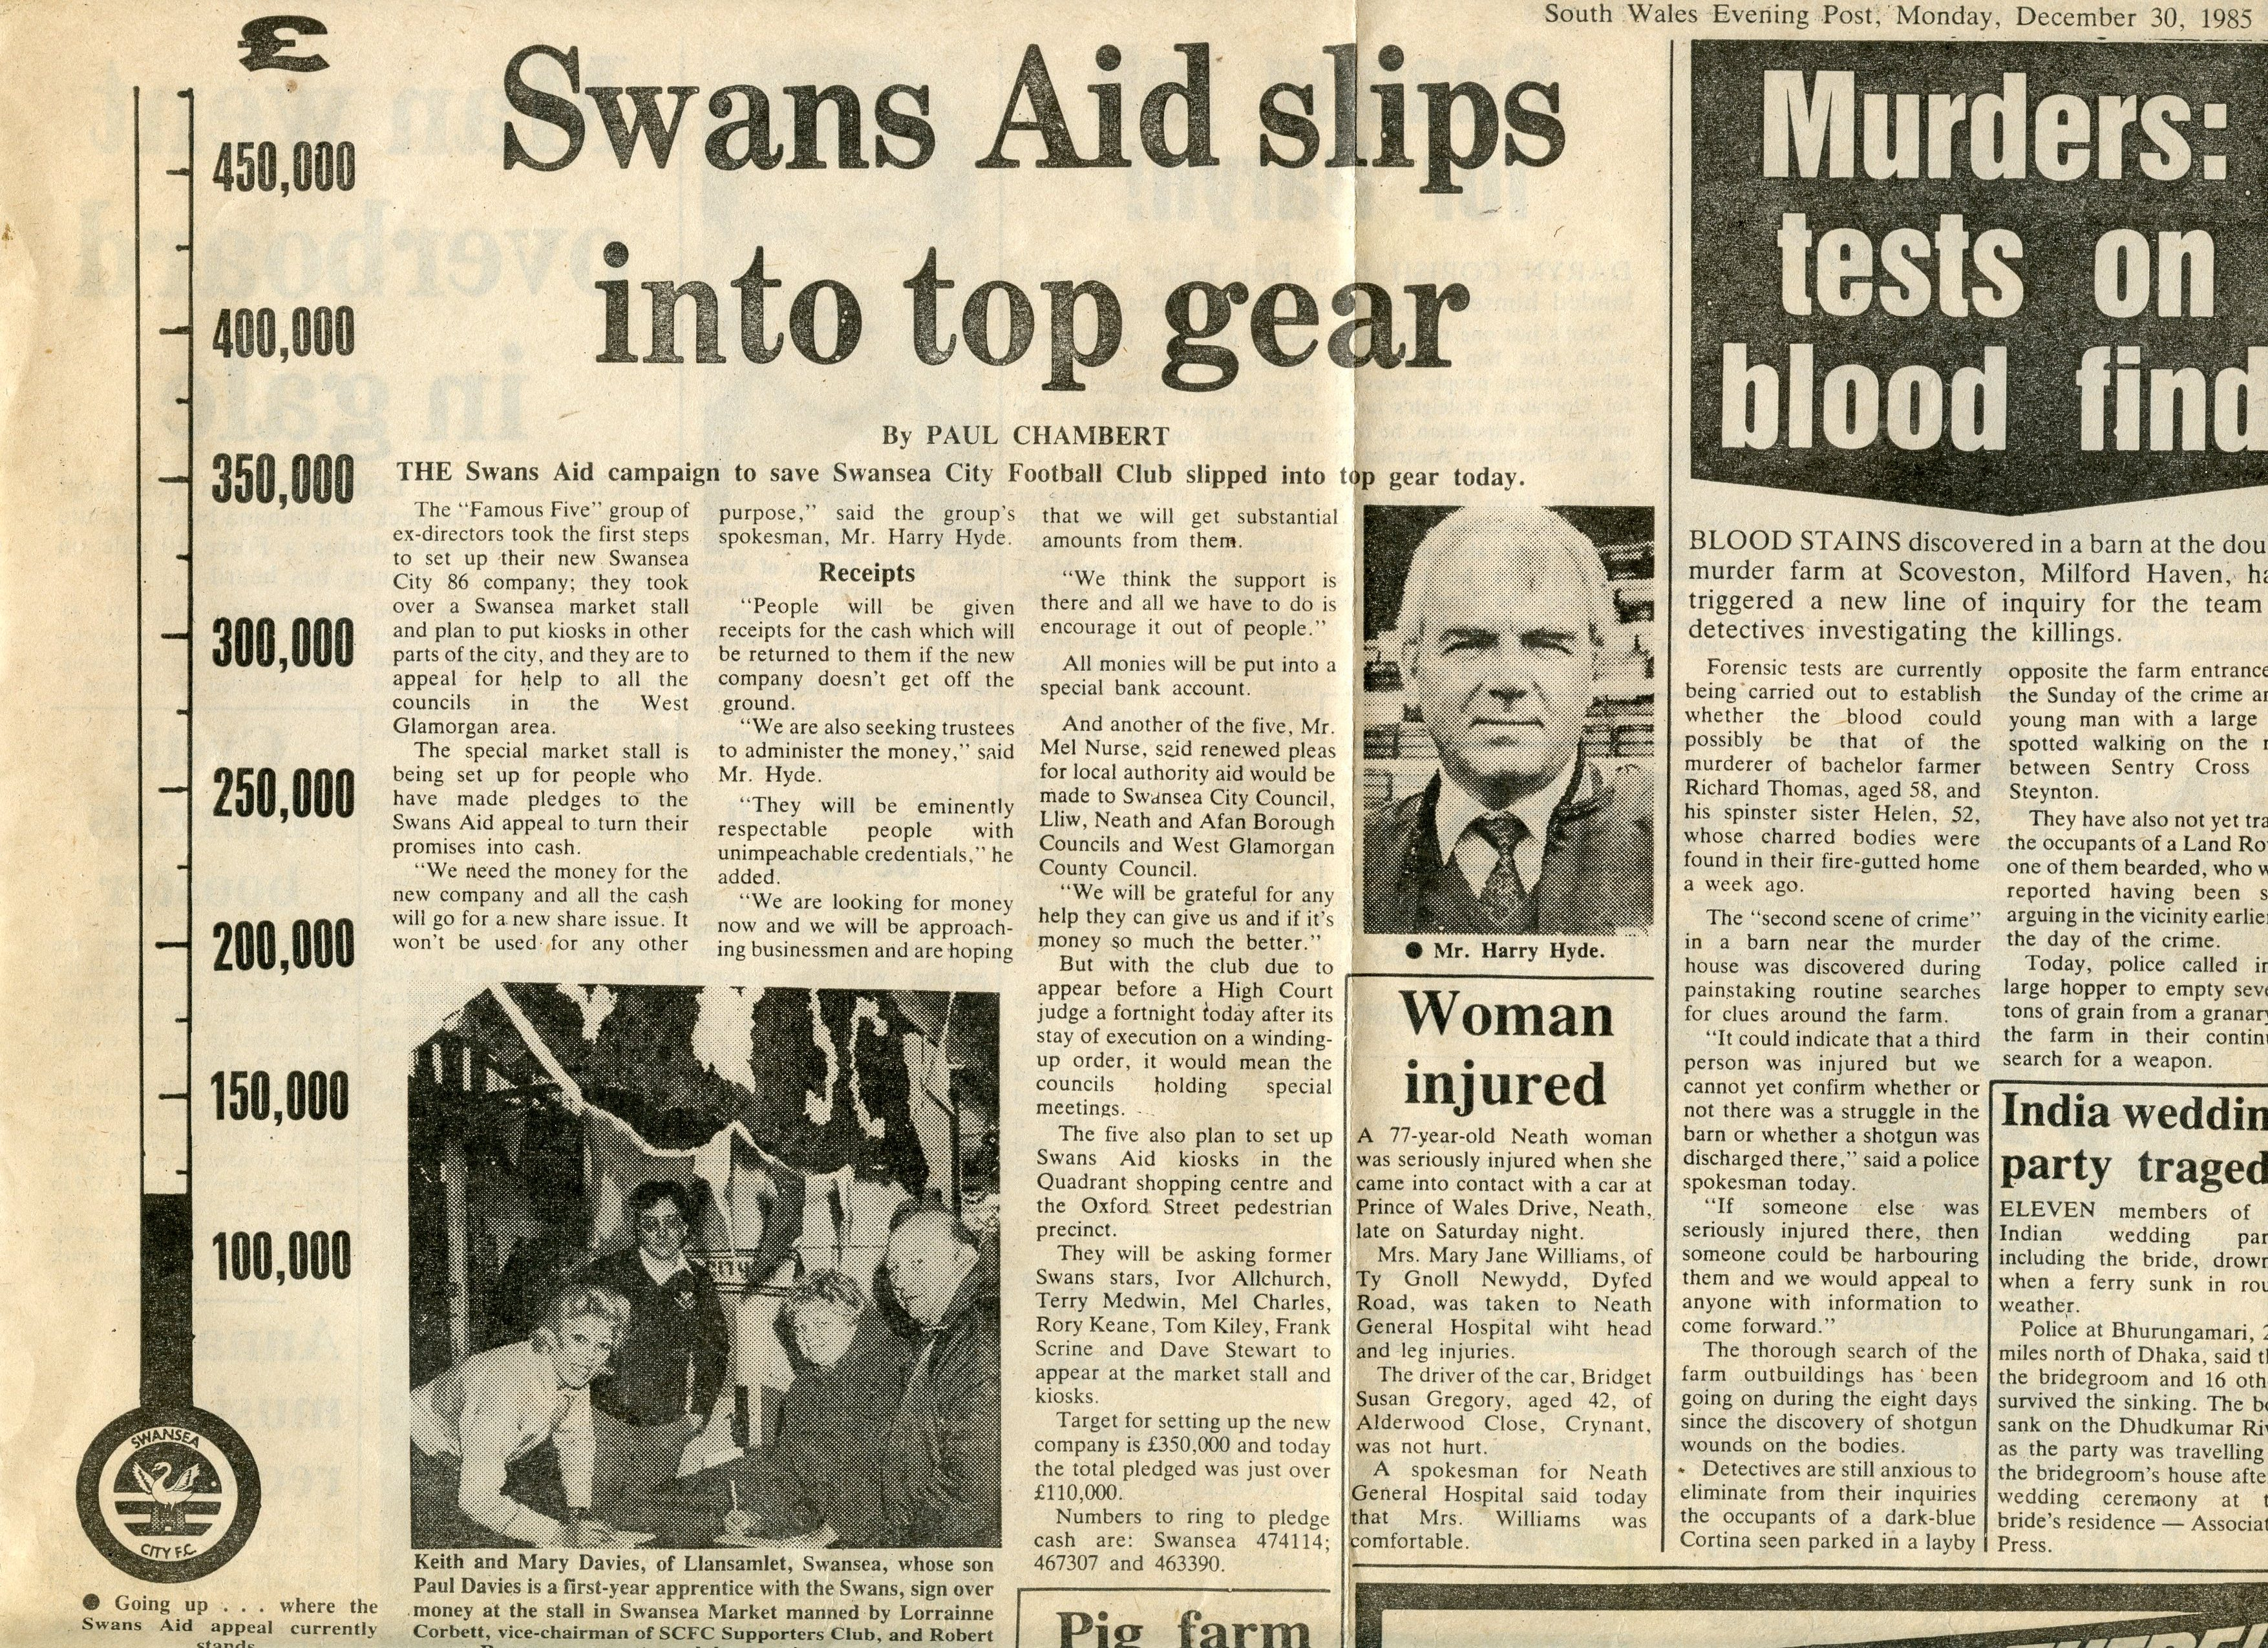 Swans Aid